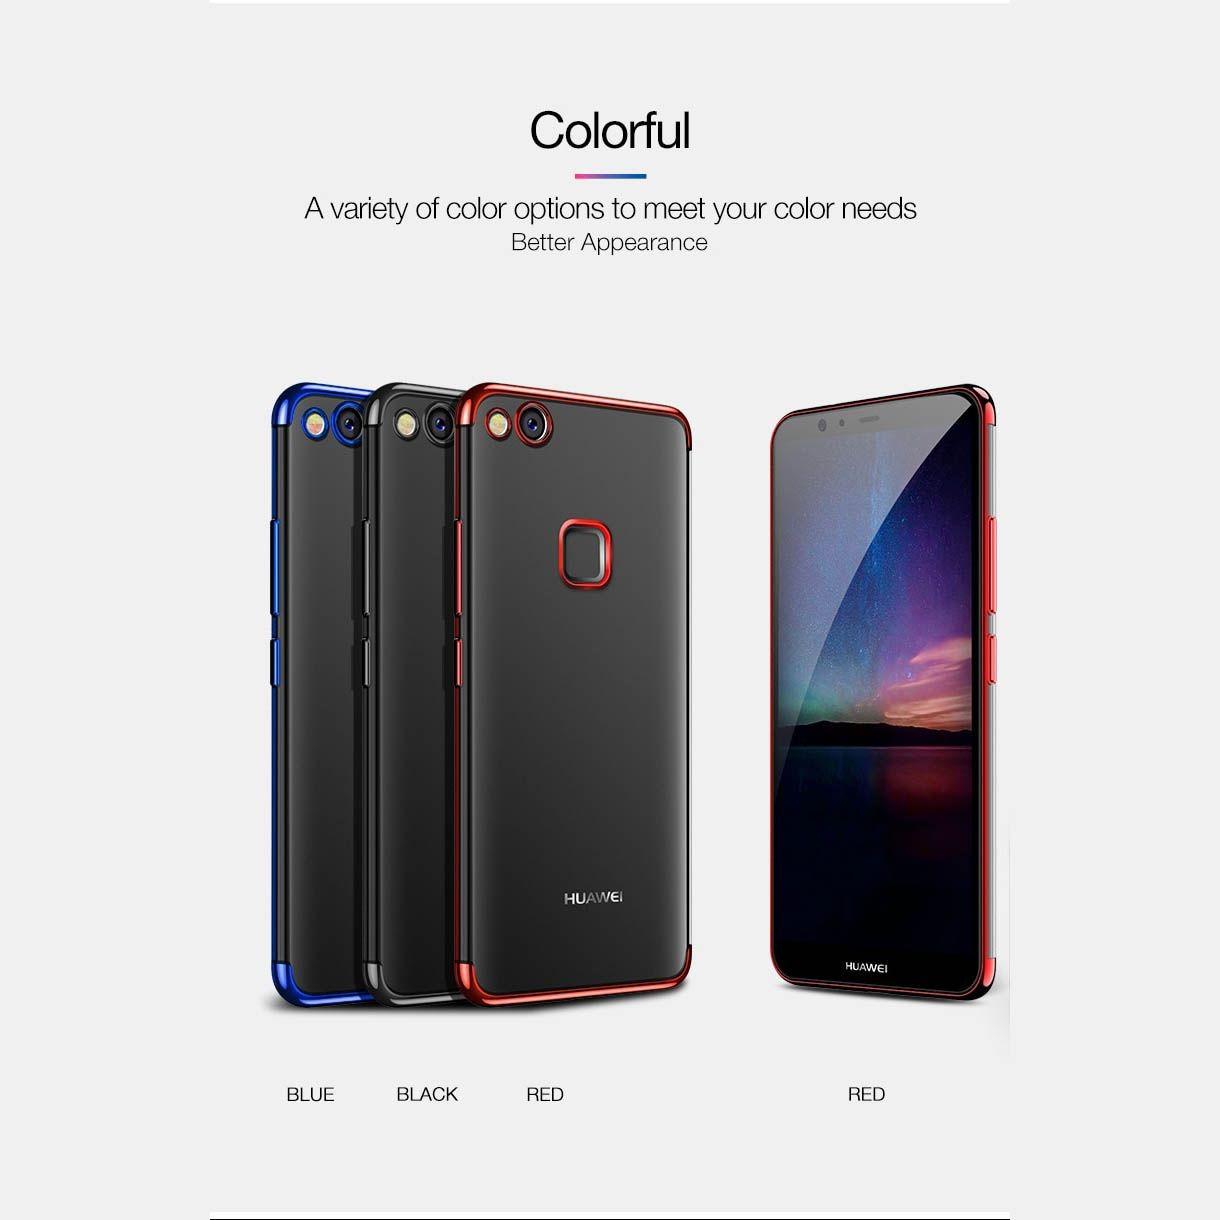 محافظ ژله ای BorderColor Huawei Honor 8 Lite